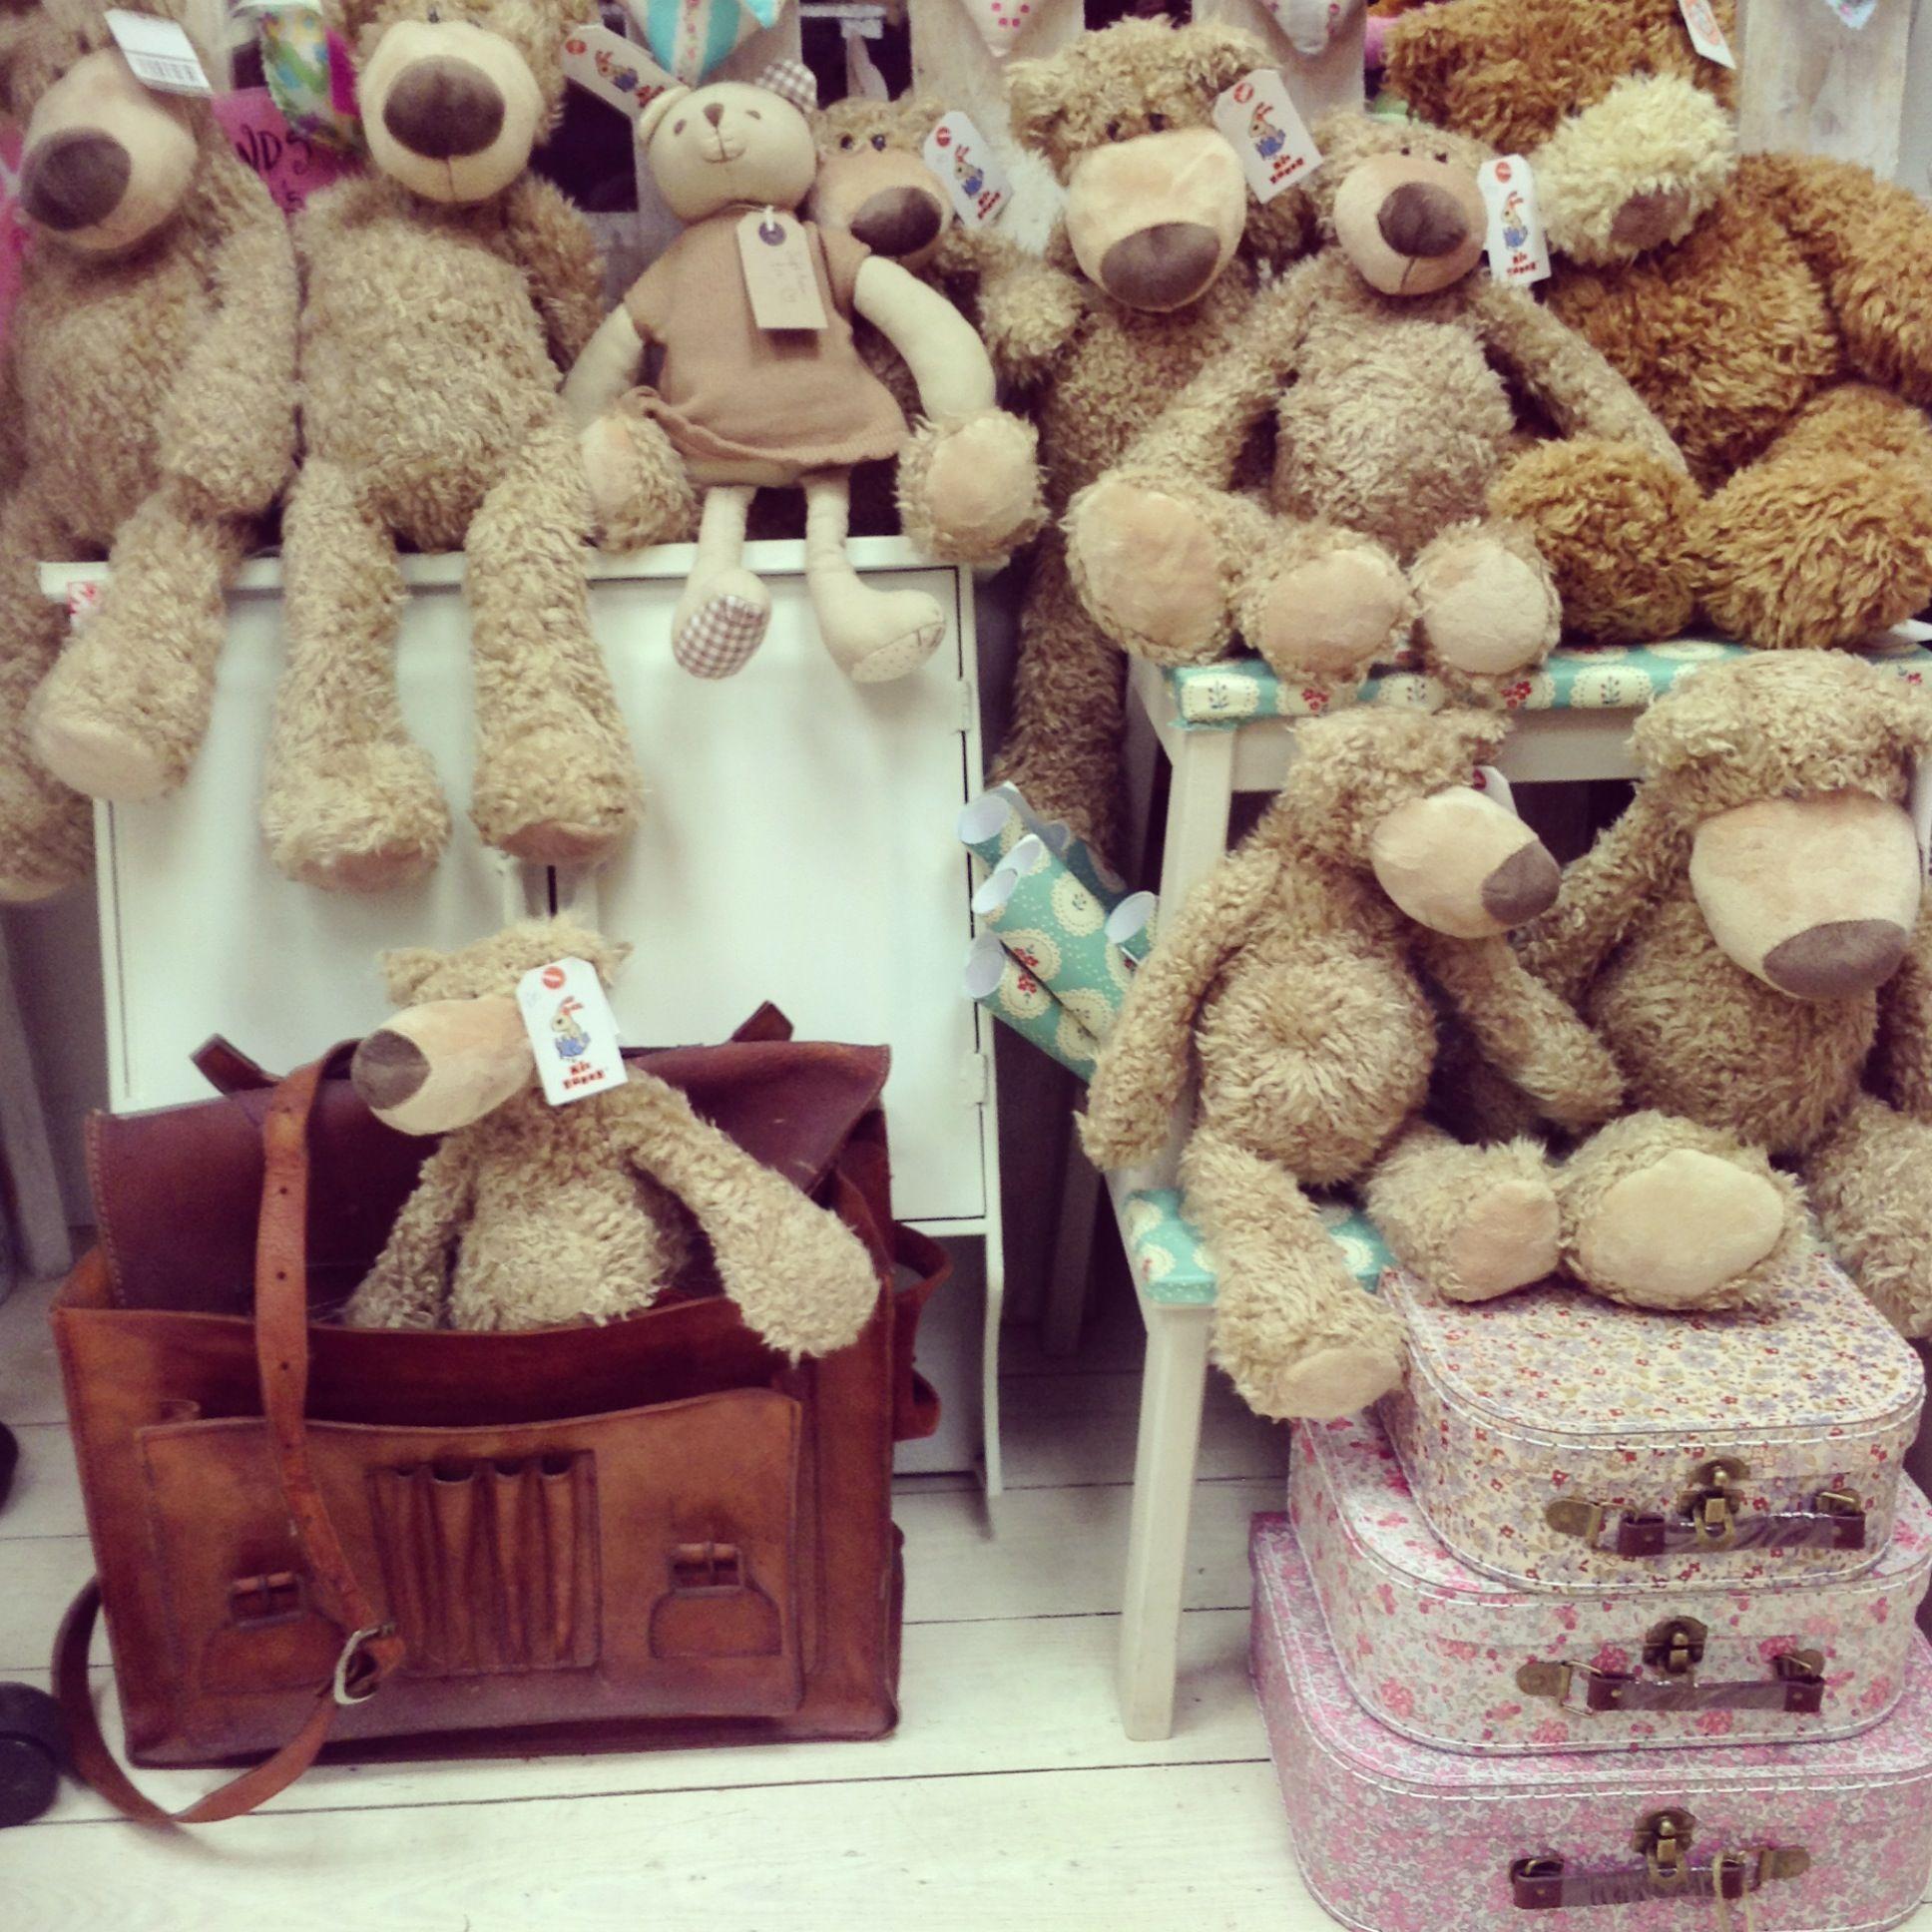 dangle bears